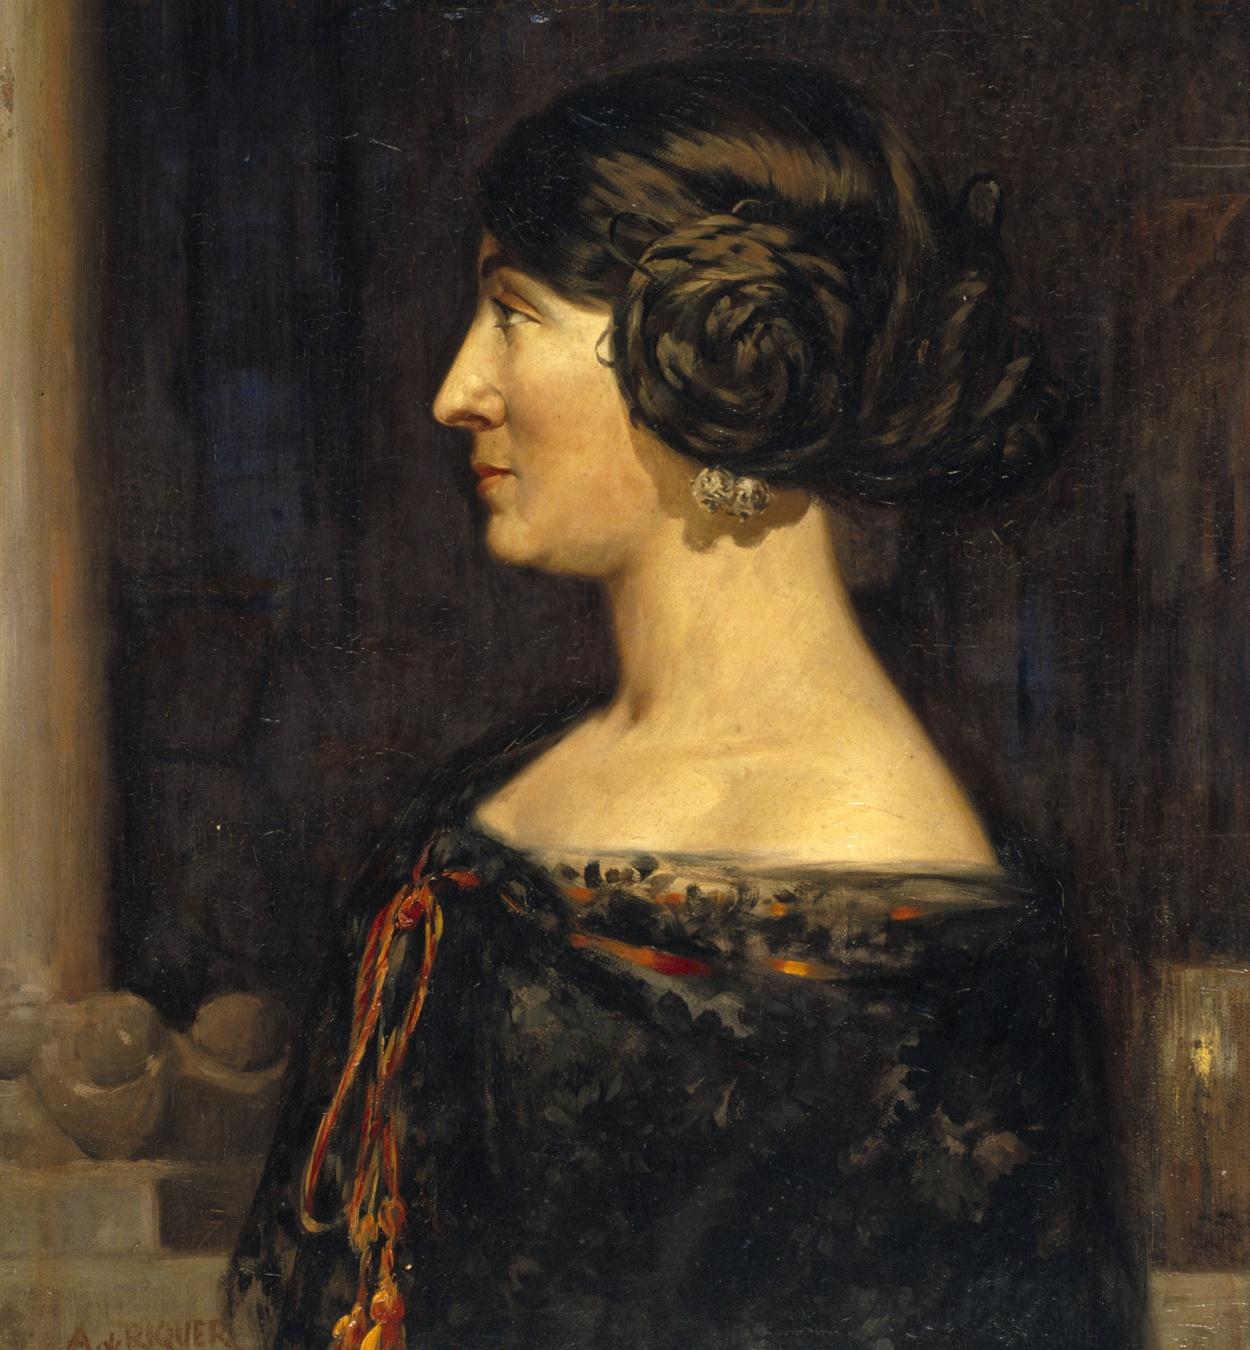 Alexandre de Riquer - Portrait of the writer Margarida Laborde (Andrée Bearn-Hein) - 1911